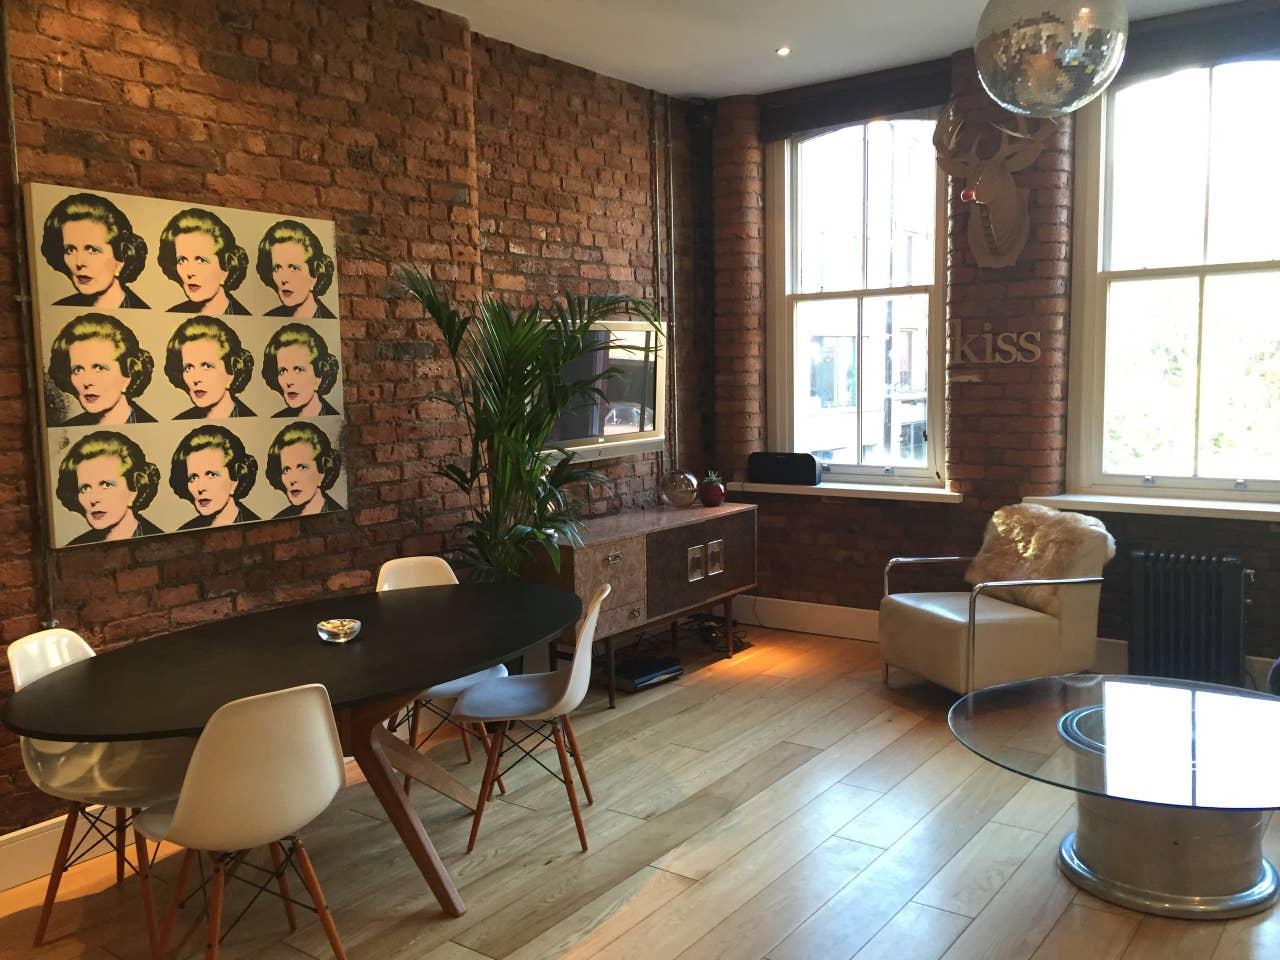 best airbnbs in Manchester U.K